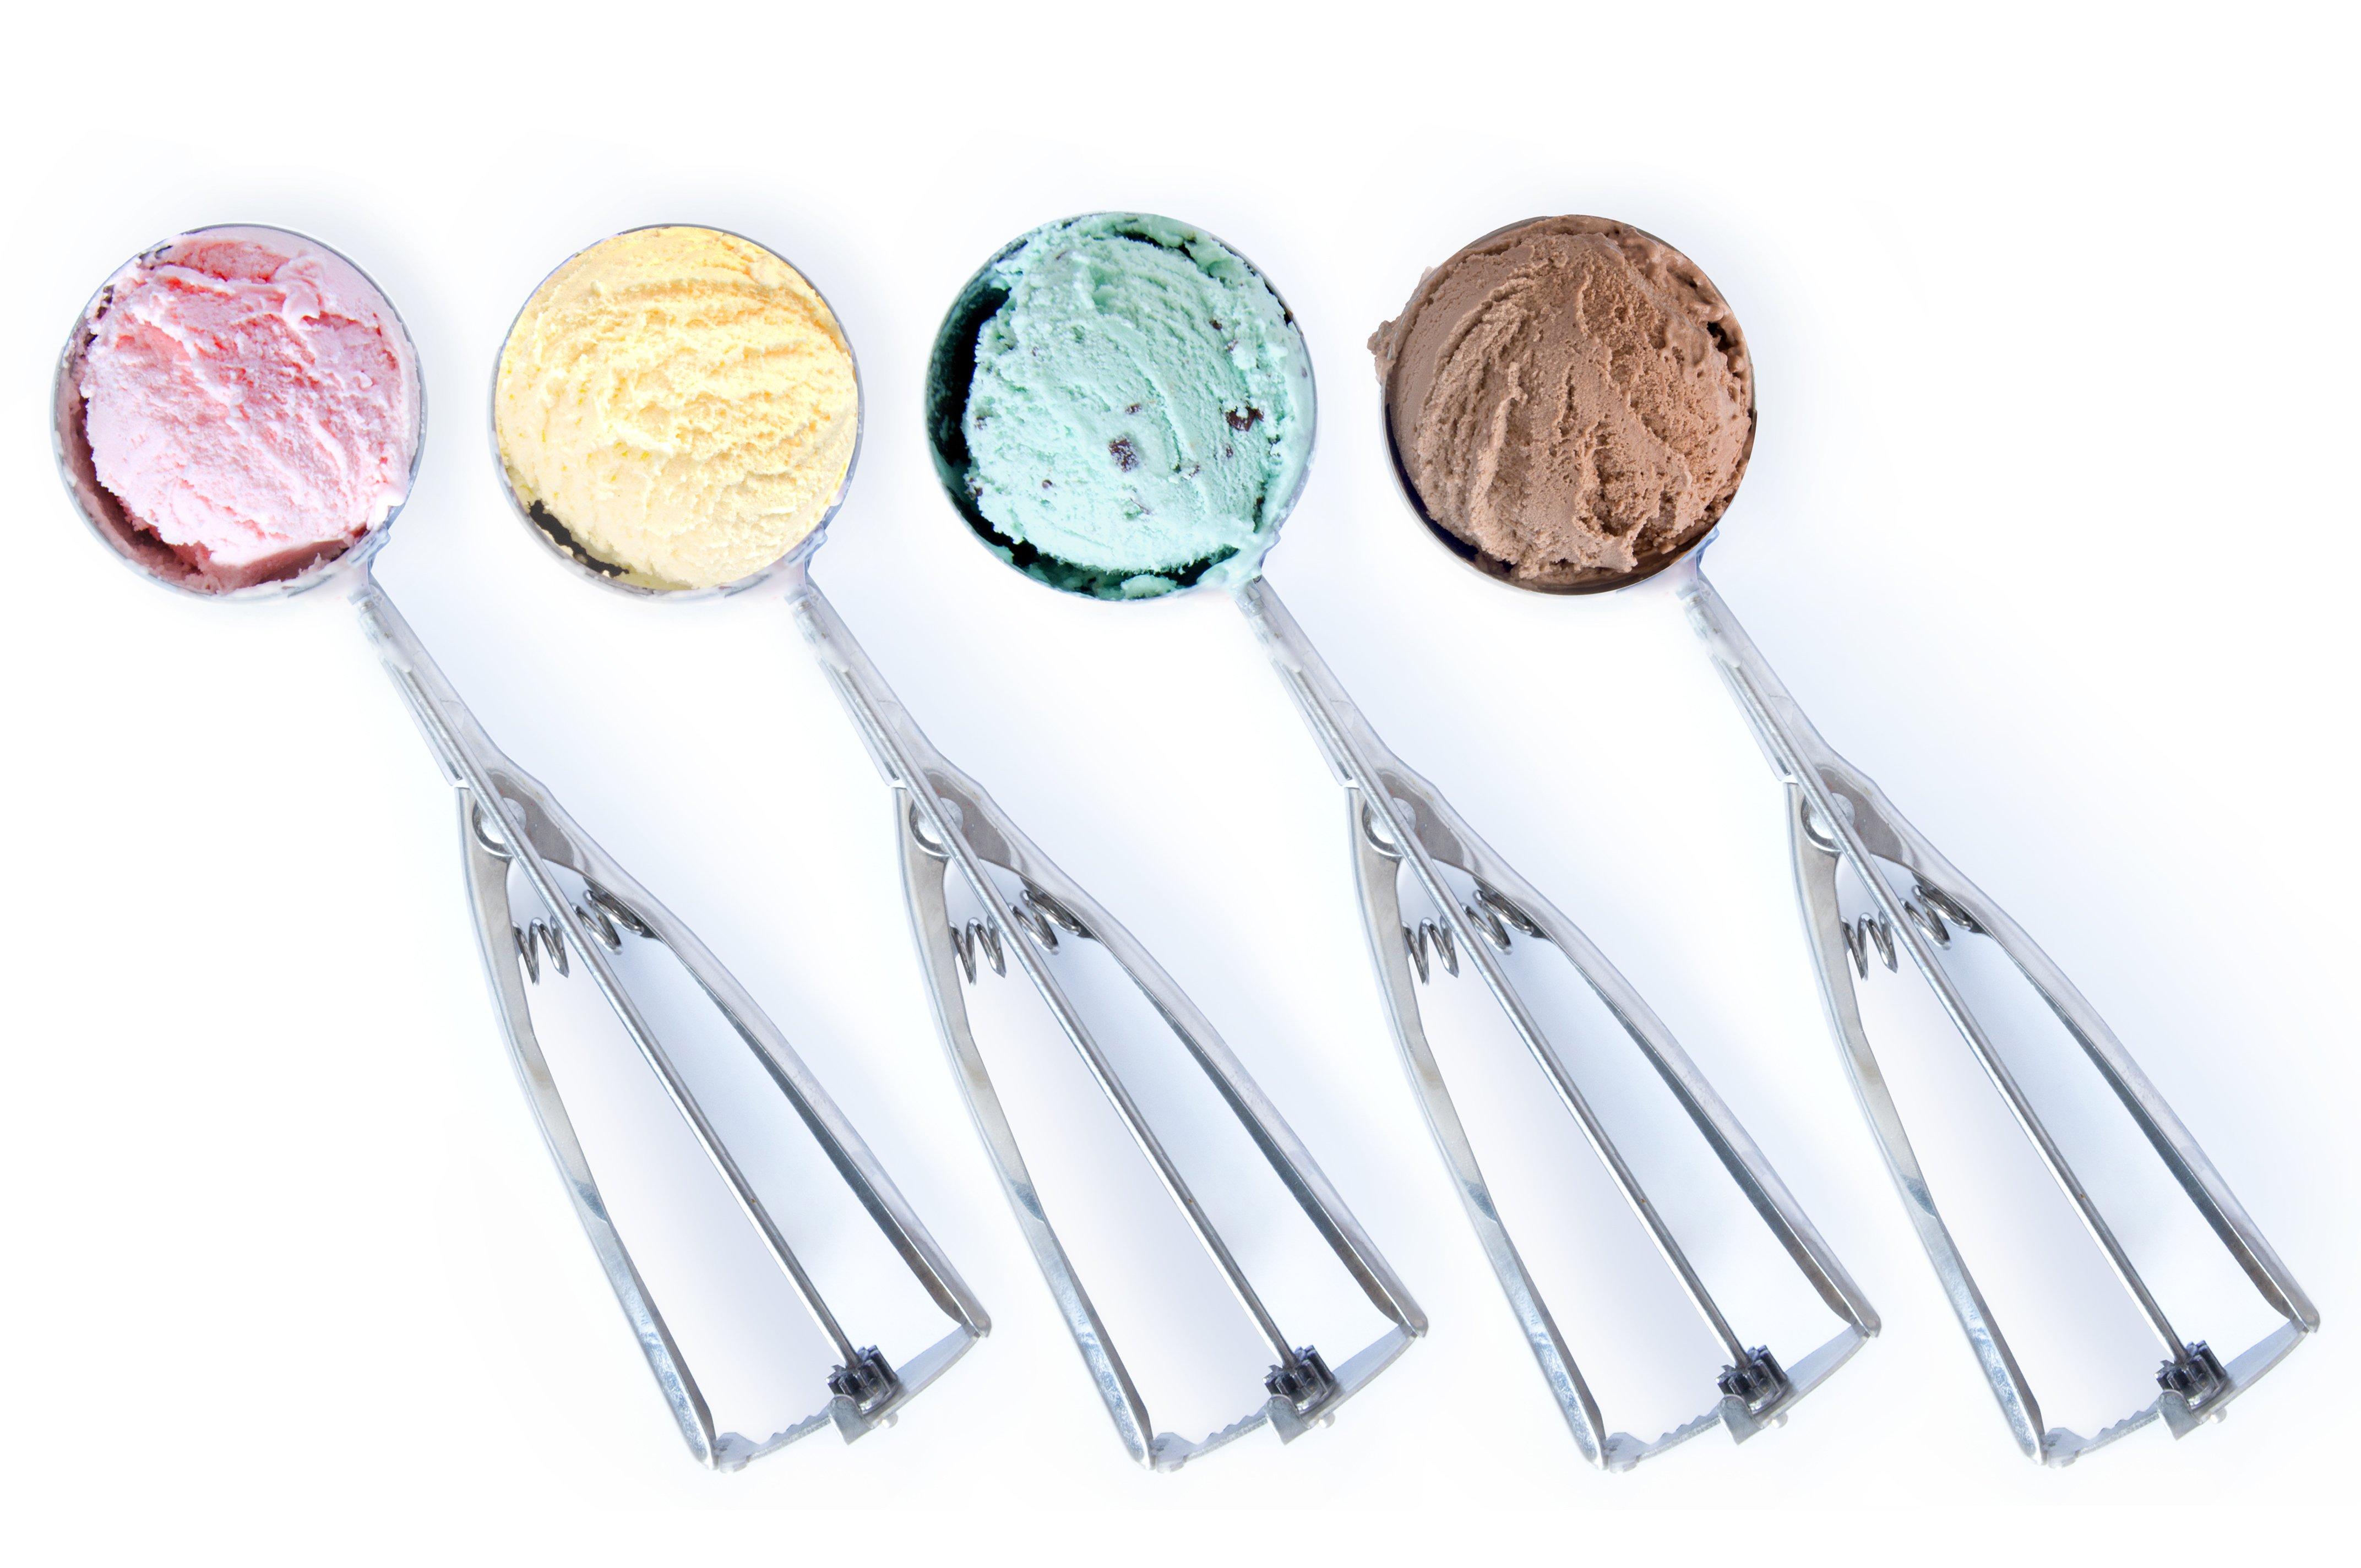 Fullsize Of Sweet Habit Ice Cream